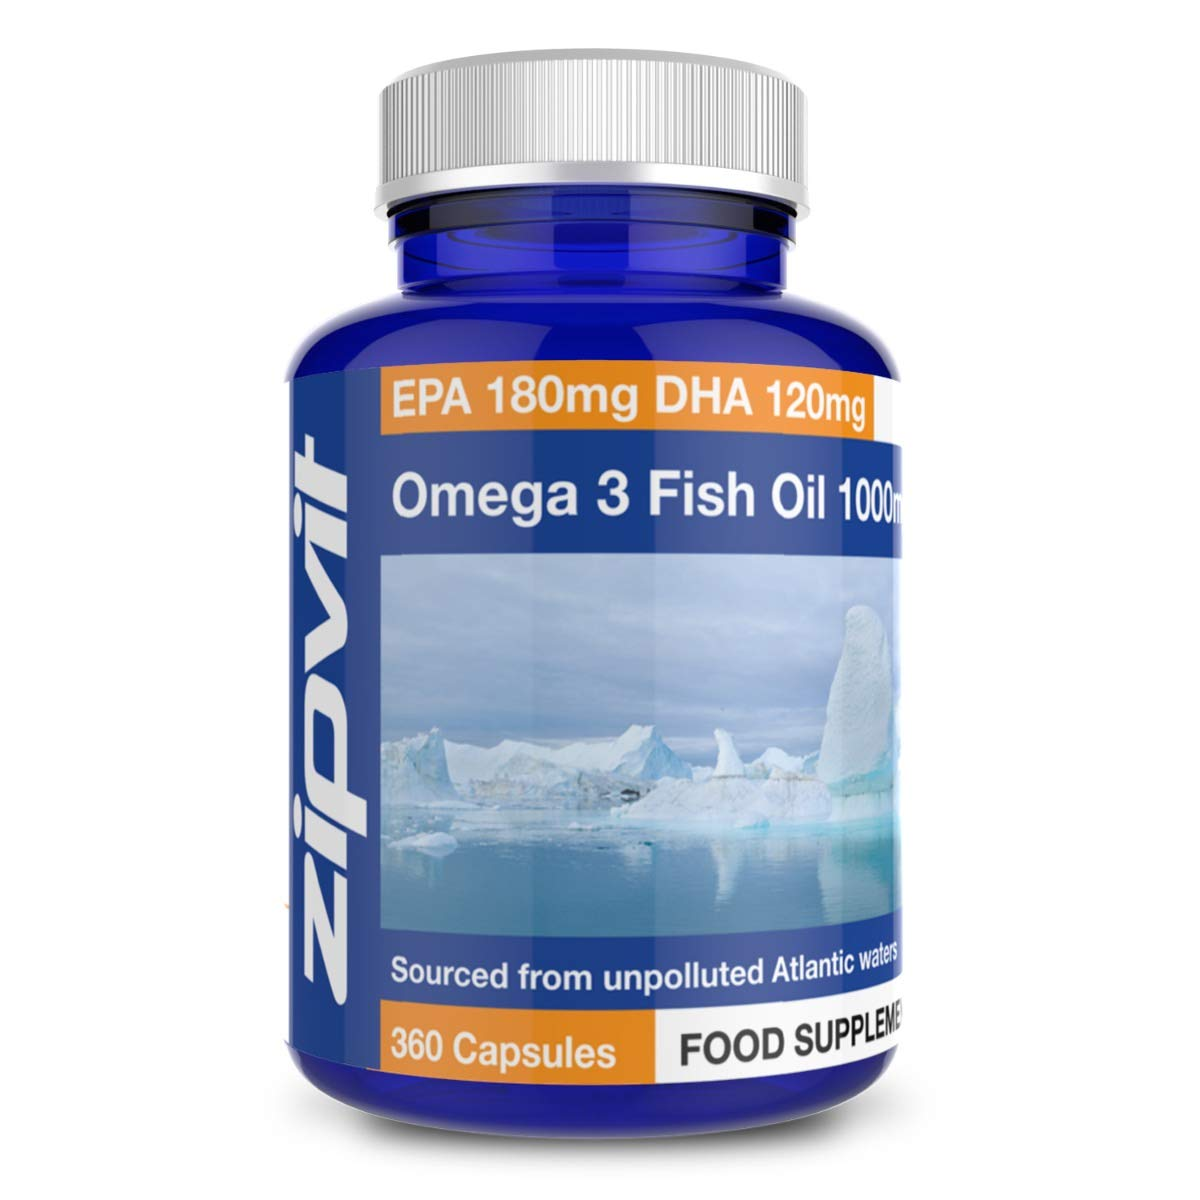 Omega 3 Fish Oil 1000mg, 360 Softgel Capsules. 12 Months Supply. EPA 180mg DHA 120mg. Supports Heart, Brain Function and Eye Health.